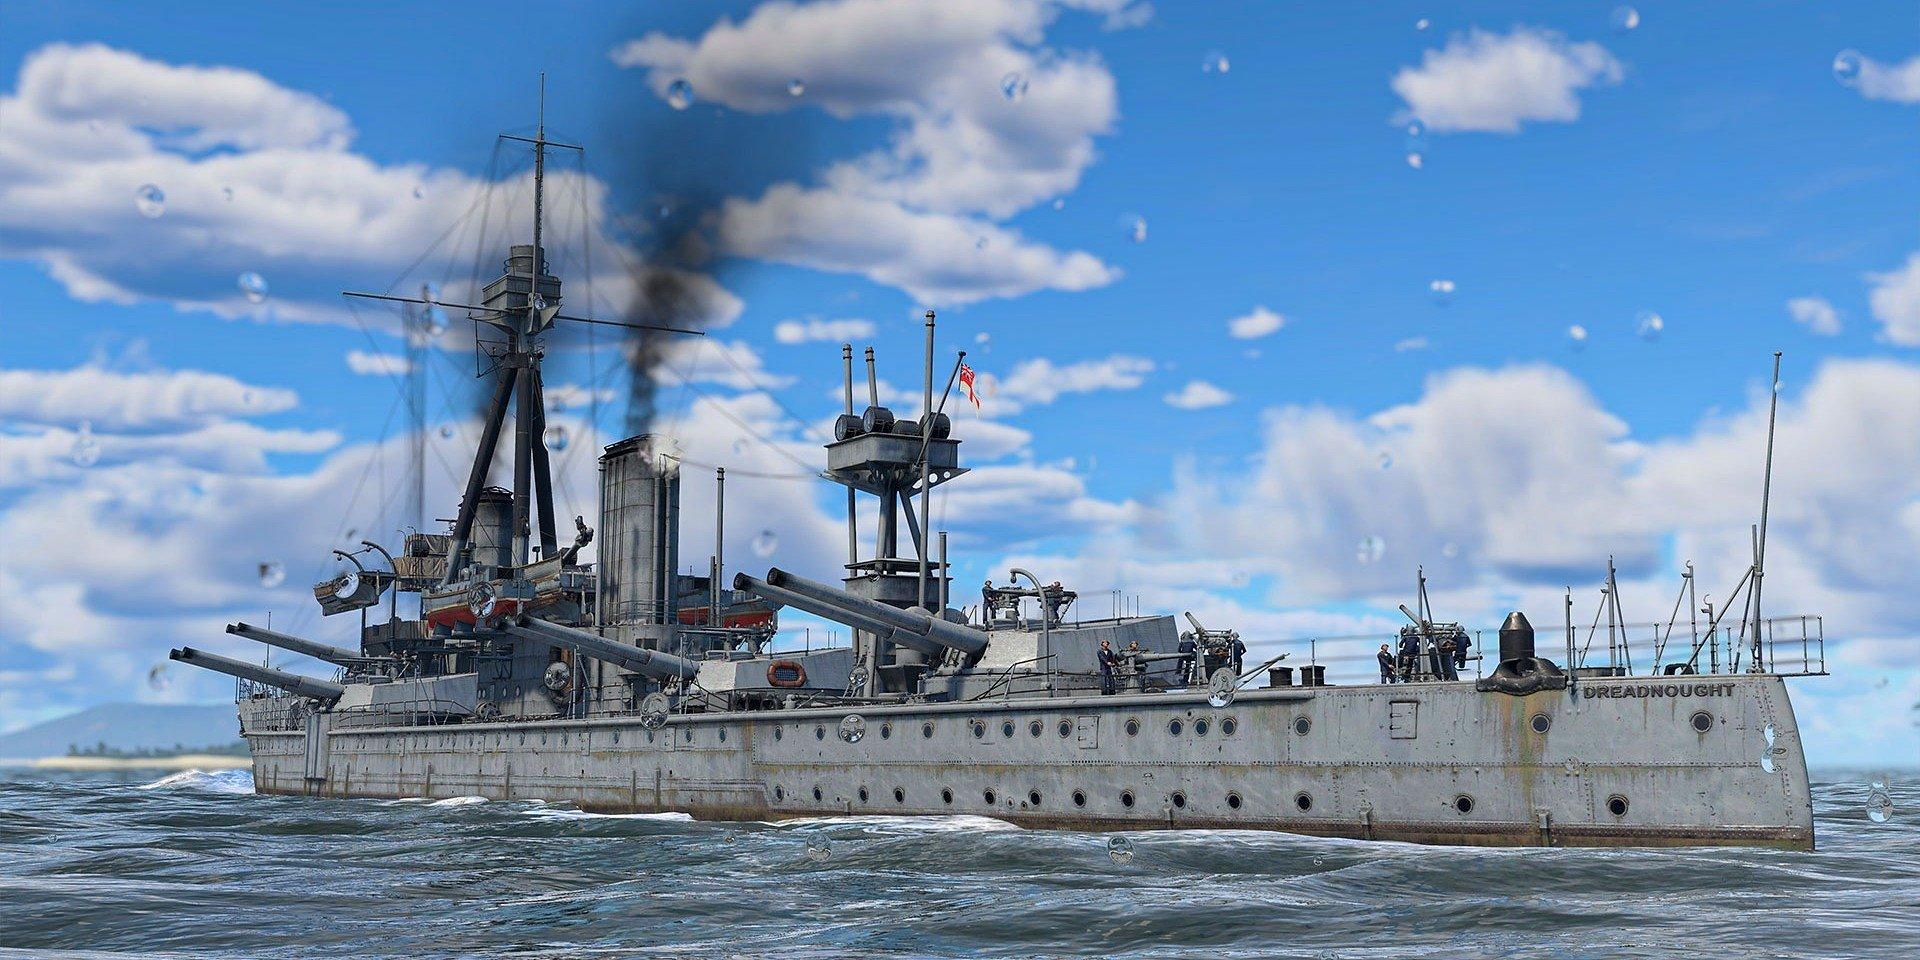 War Thunder is deploying blue-water navy